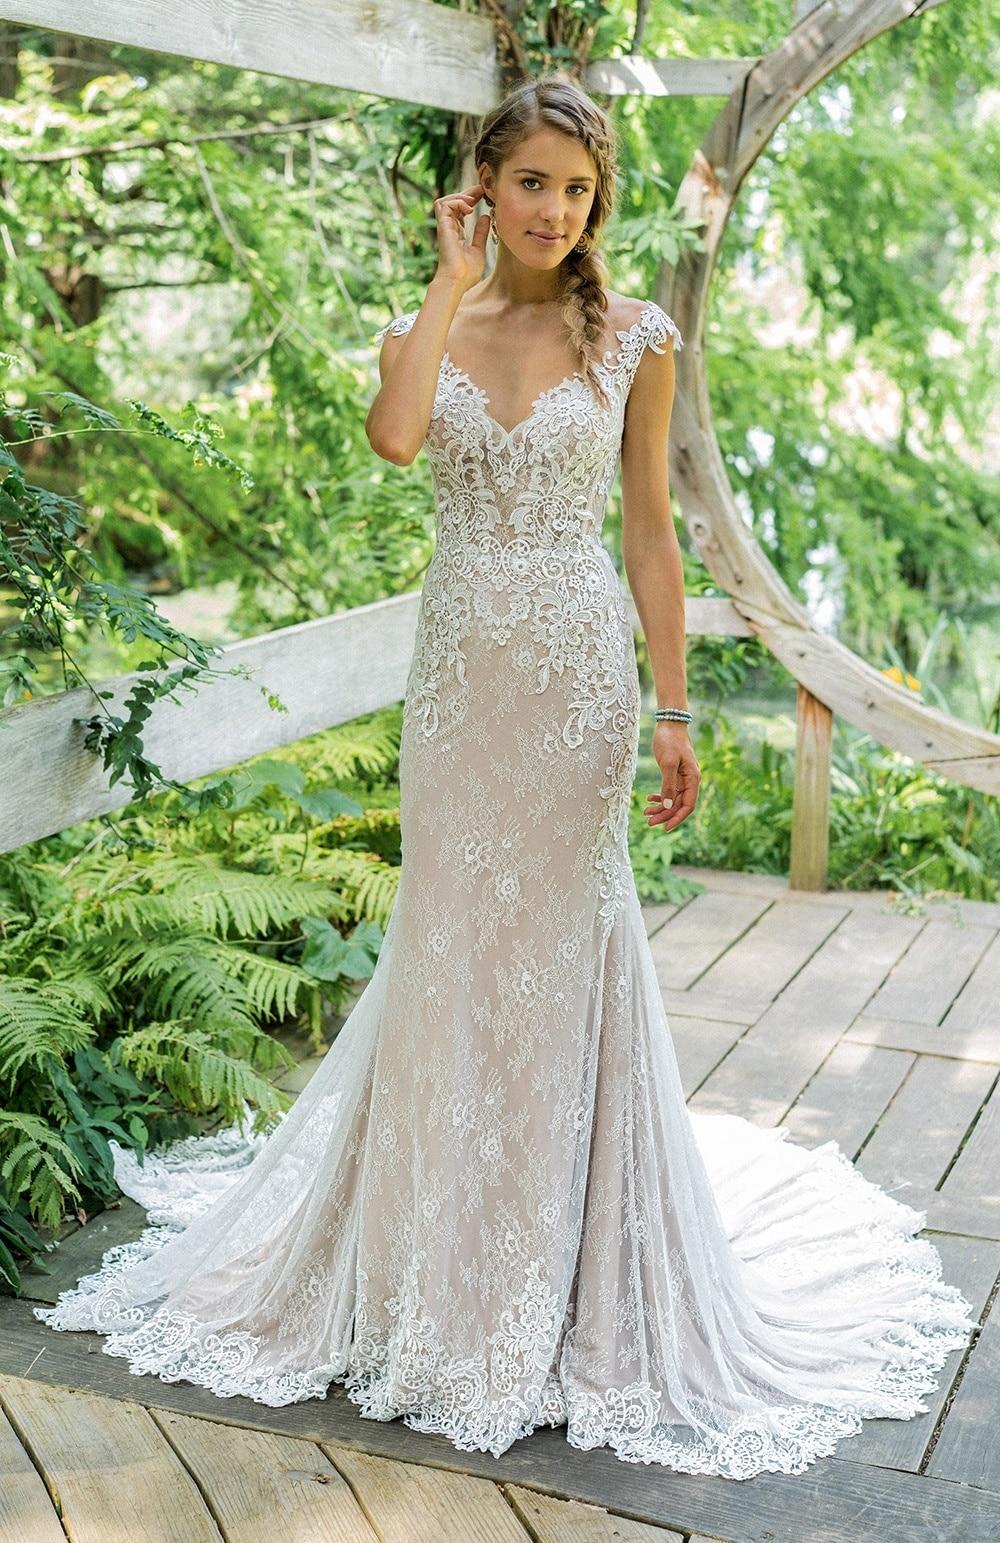 Robe de mariée Modèle Neda – 66012